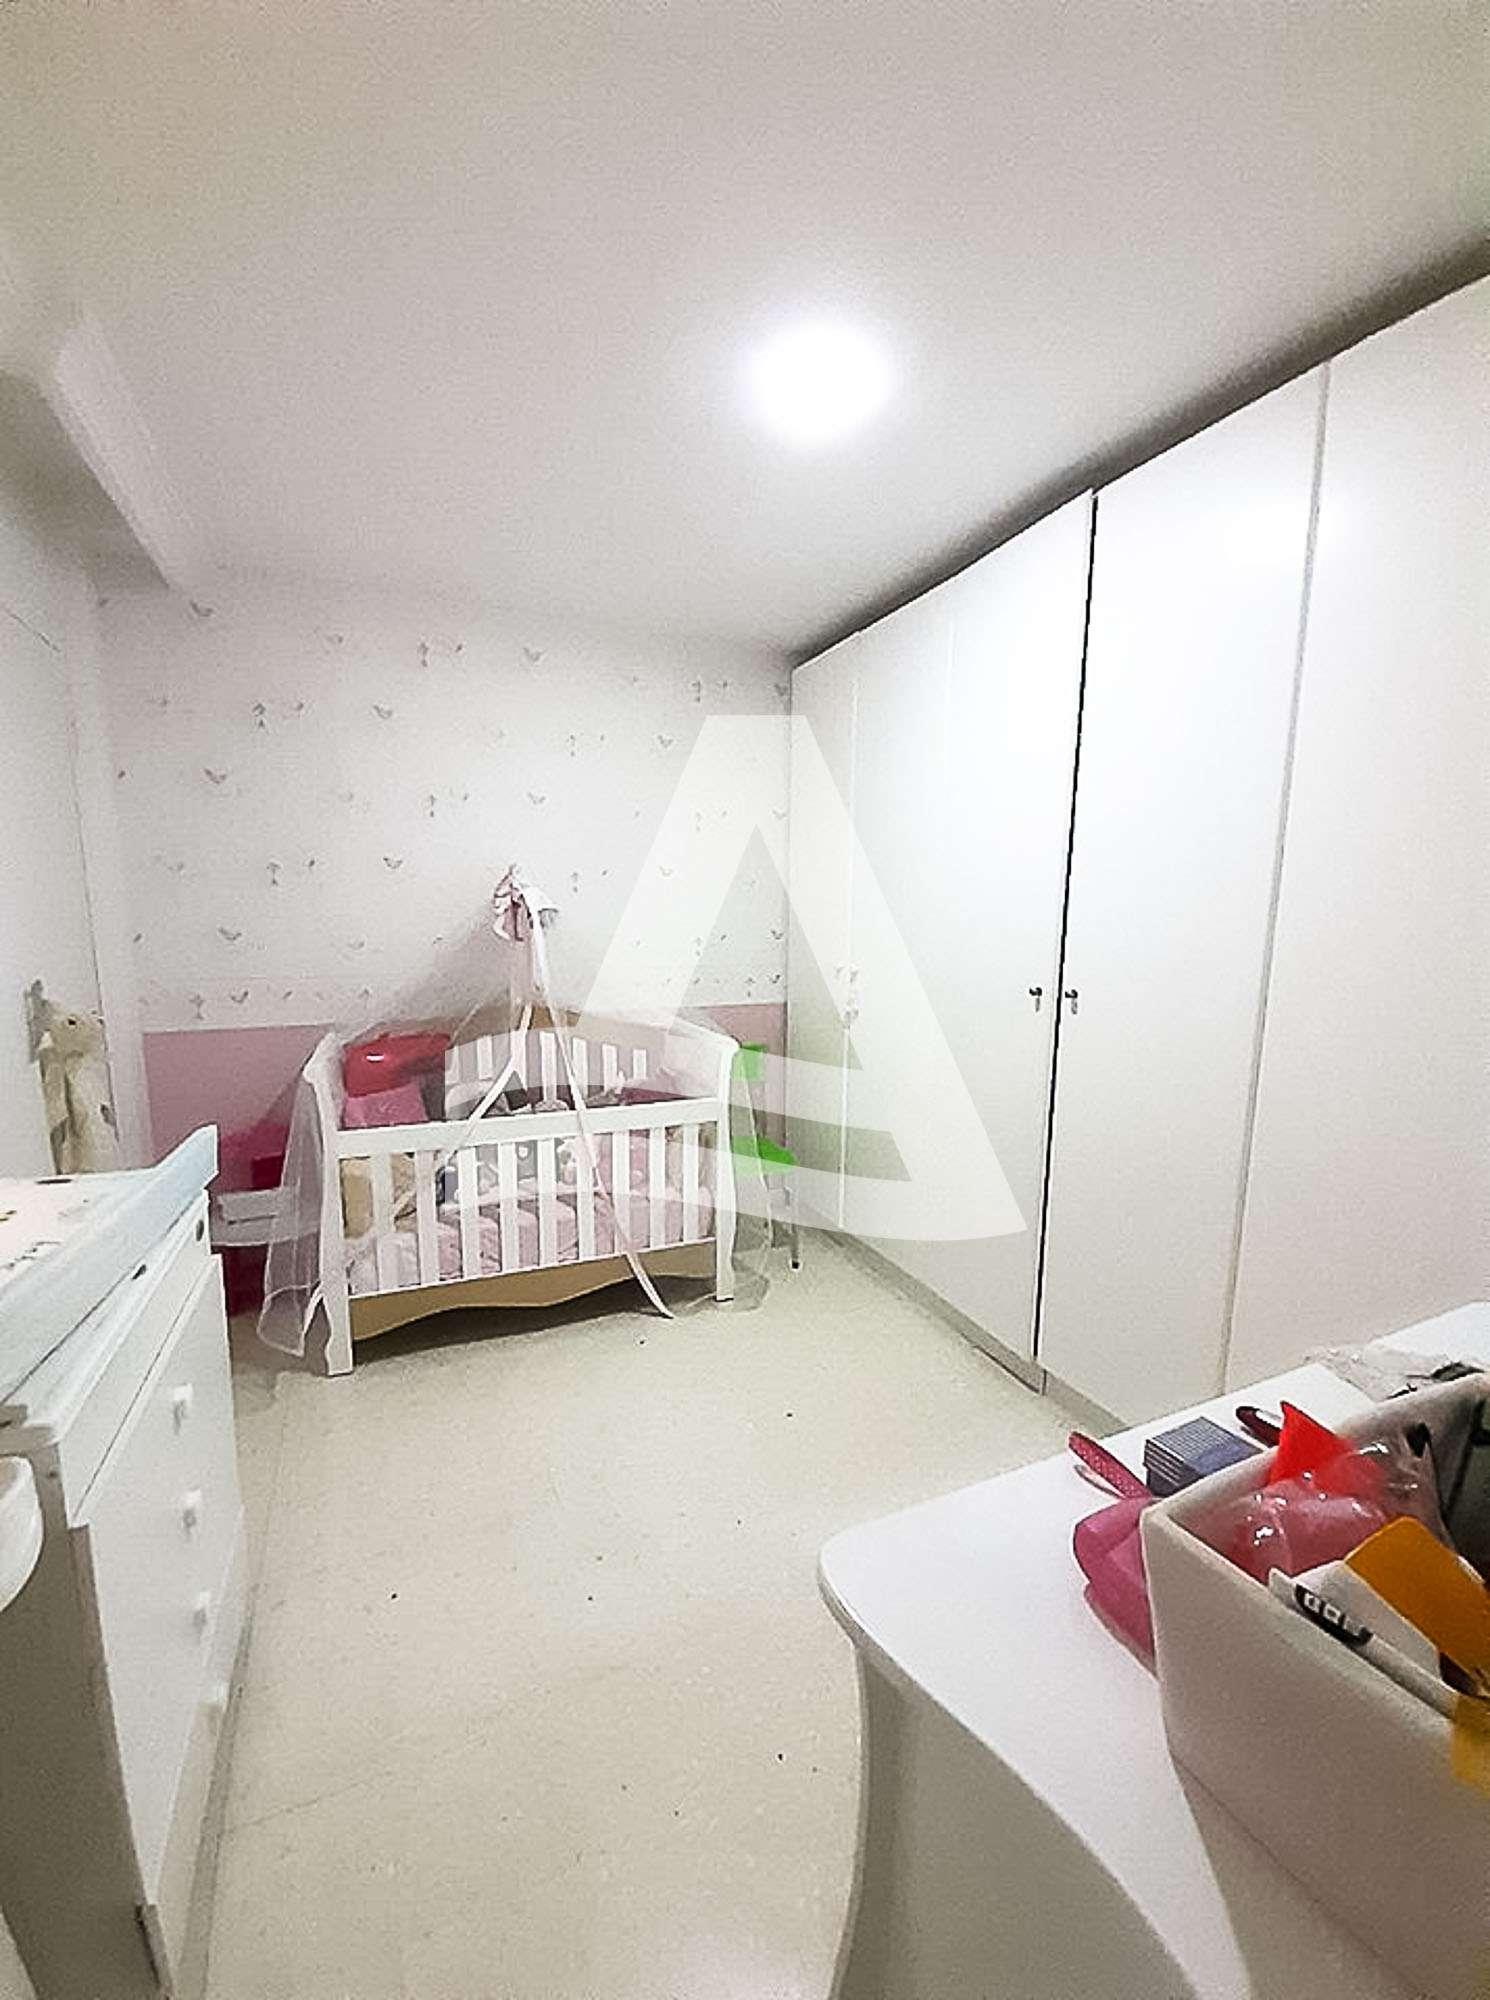 httpss3.amazonaws.comlogimoaws_Arcane_immobilière_la_Marsa-_location_-_vente_la_marsa_8_sur_16_1574071698426-1